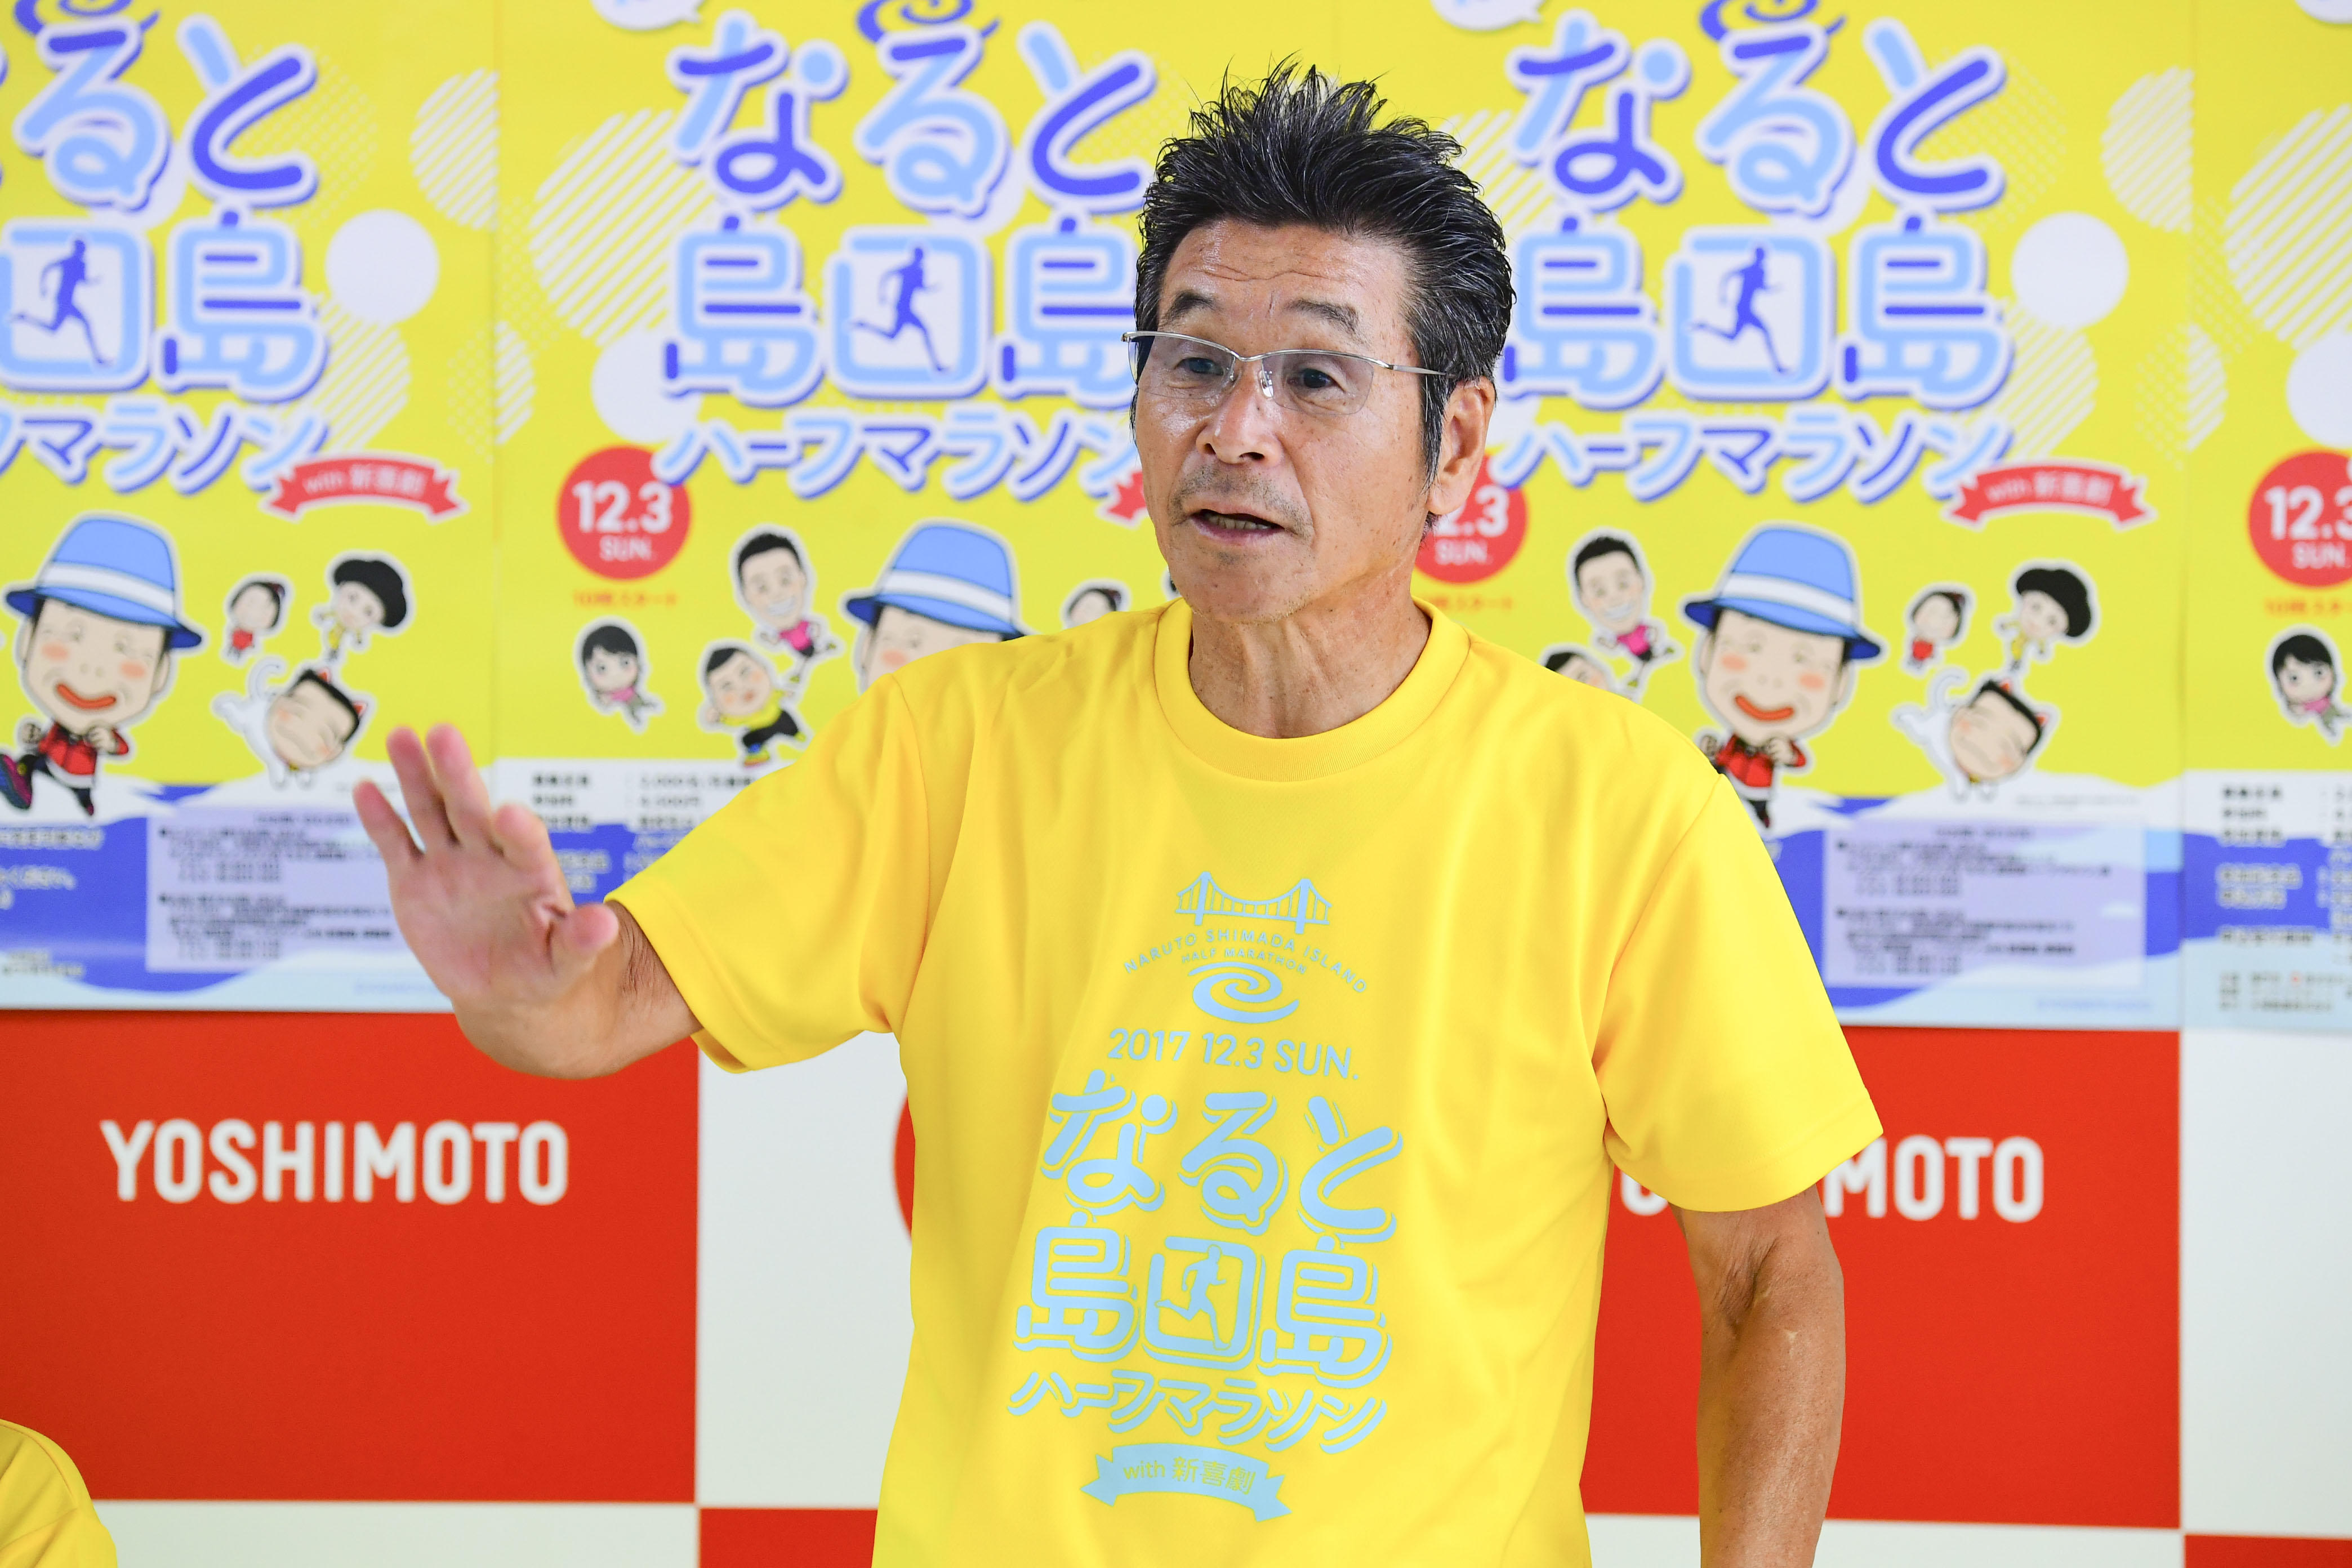 http://news.yoshimoto.co.jp/20170911181820-87c40f42d5521c9769931deb3094534c7bb26da8.jpg